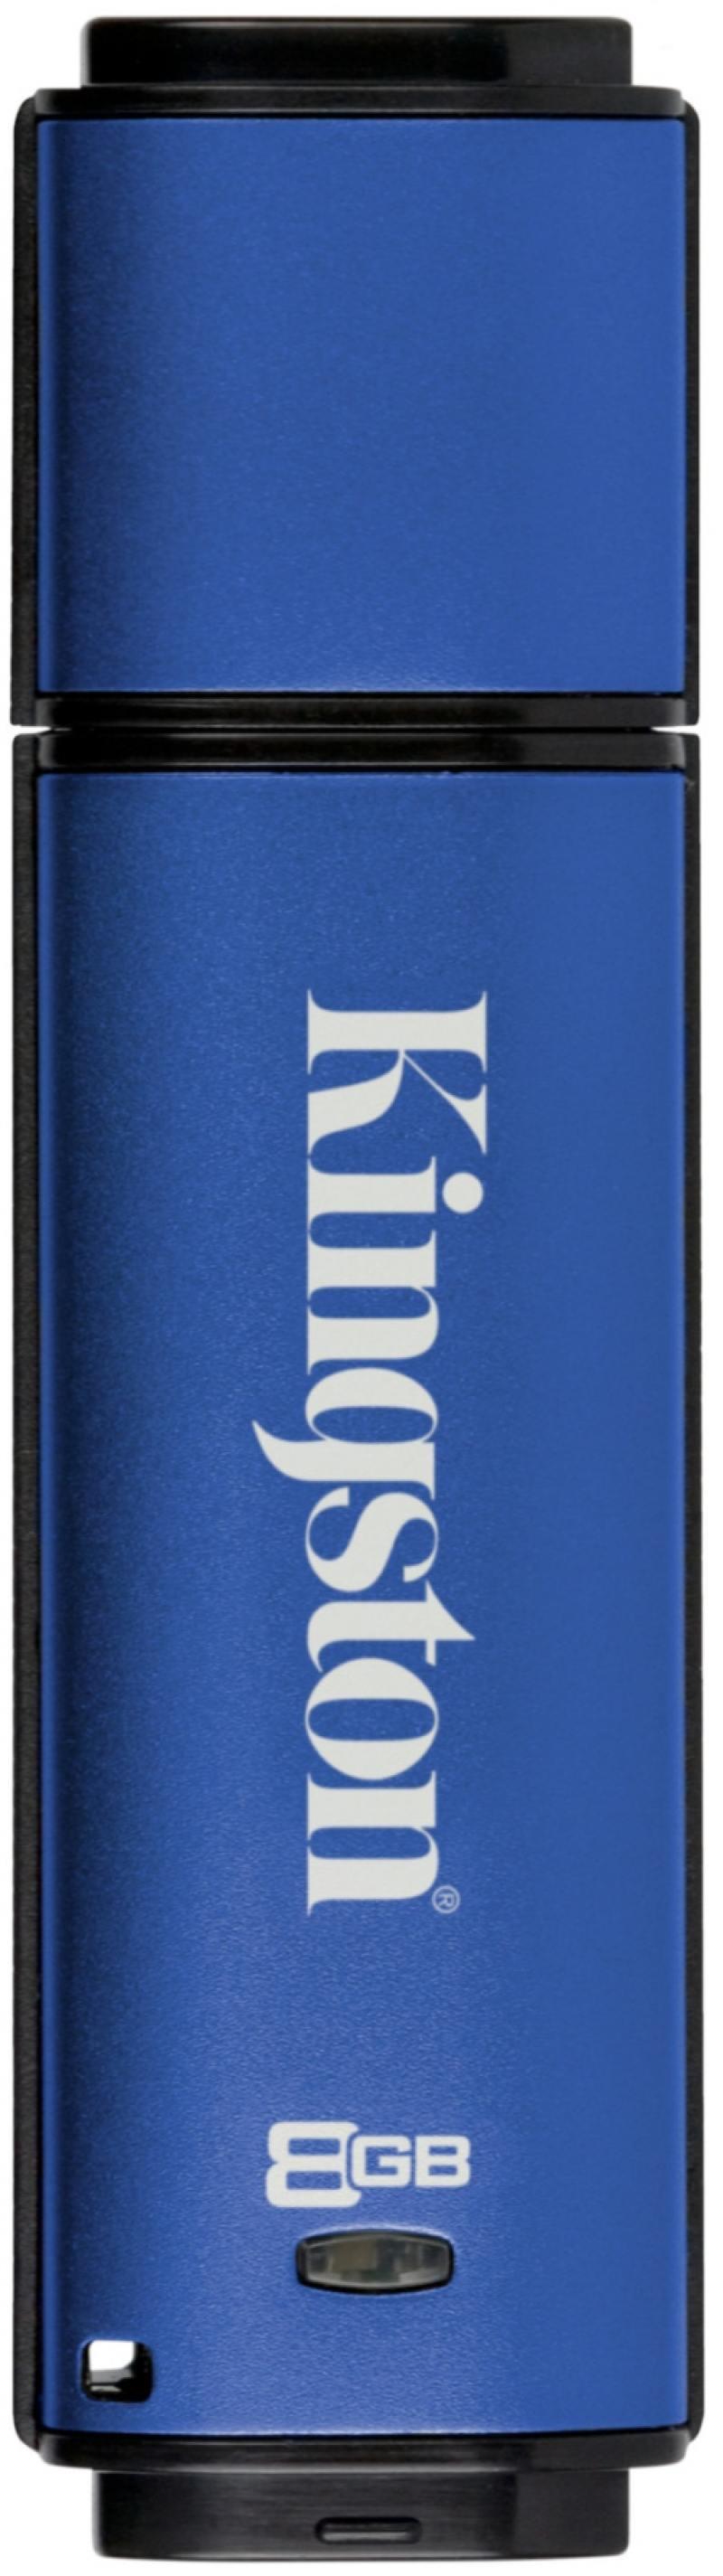 Флешка USB 8Gb Kingston DataTraveler Vault Privacy DTVP30/8GB синий